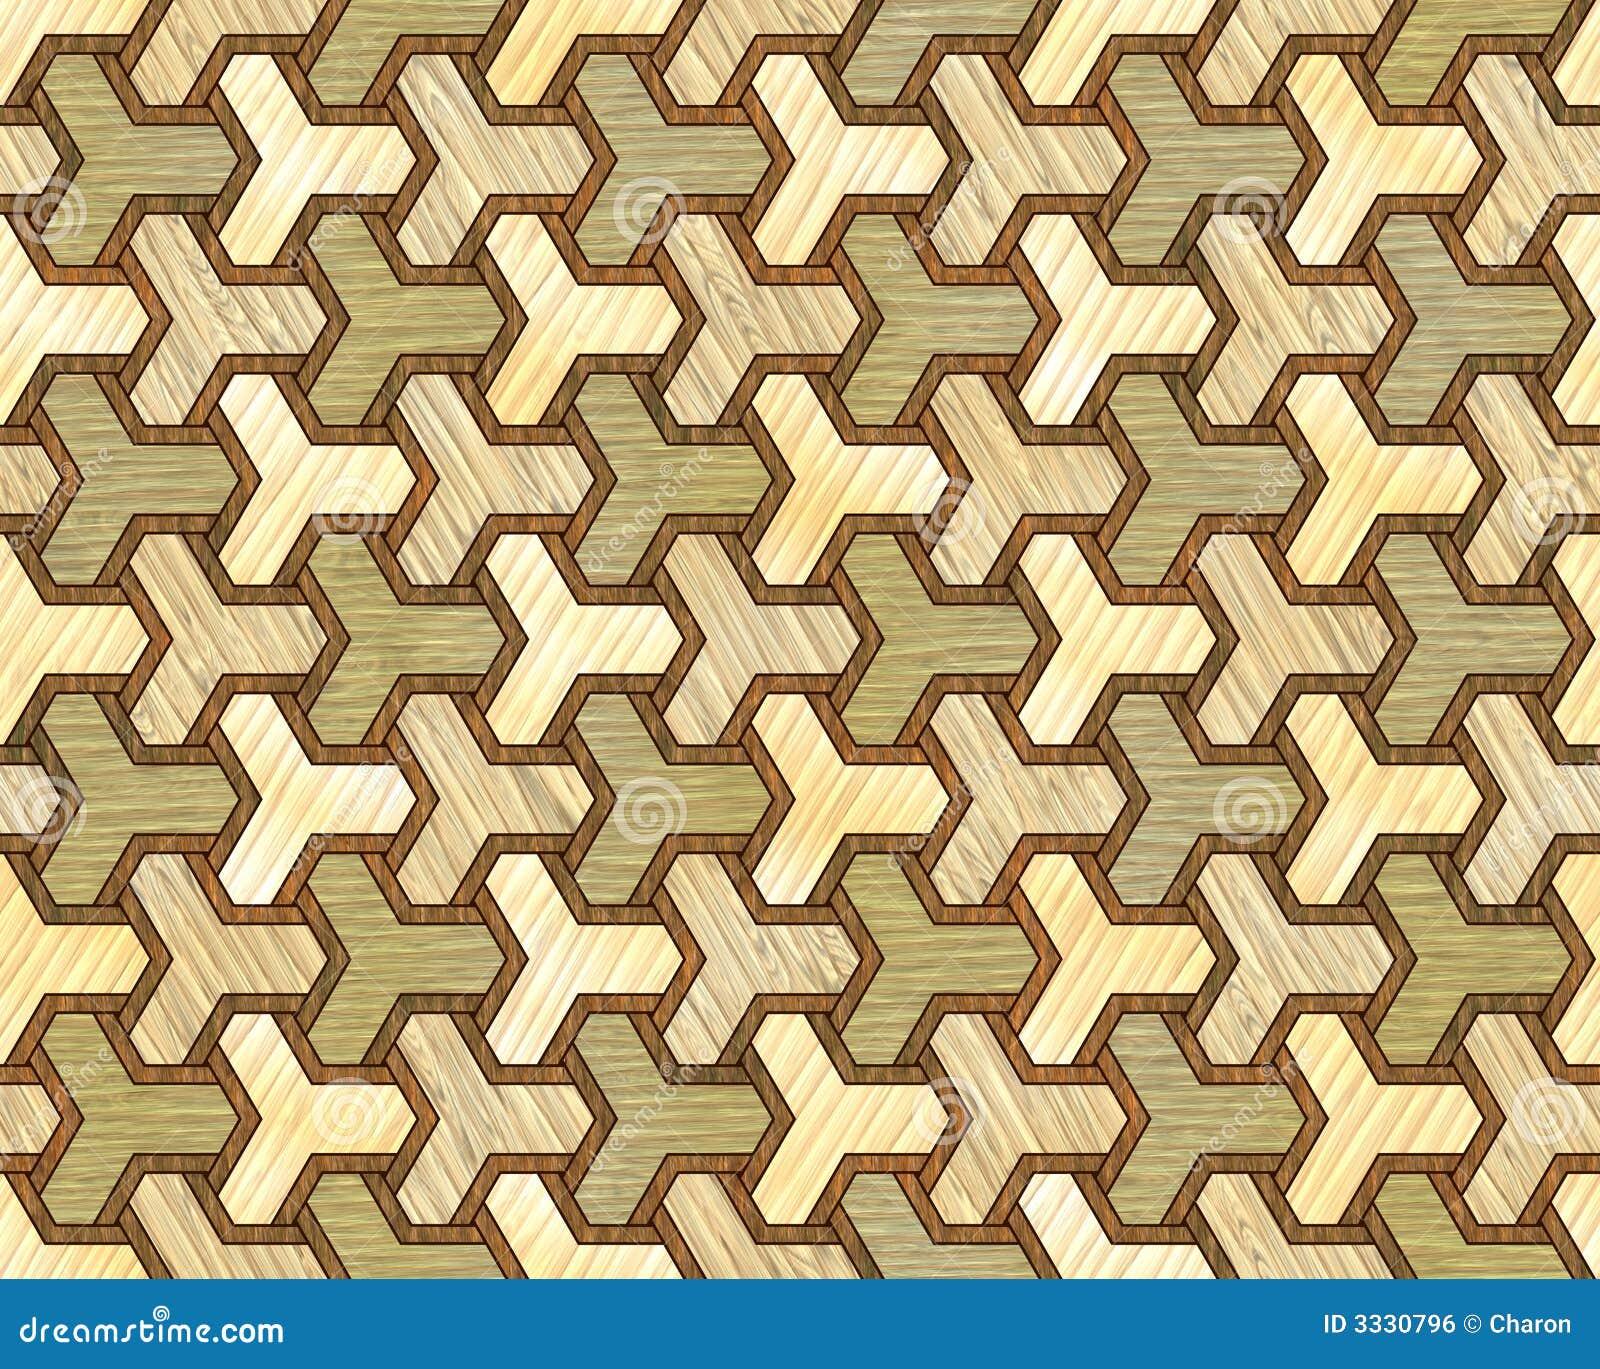 Wood Pattern Fine Inlay Texture Seamless Stock